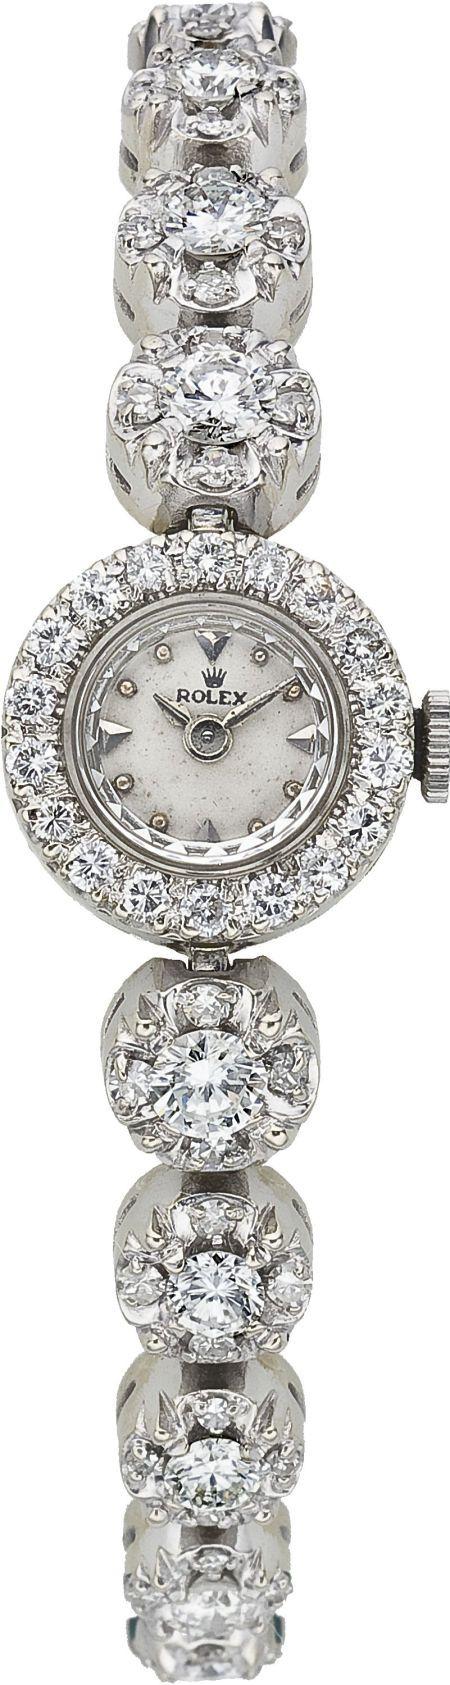 ♥••*´¨`*•.☆• вeaυтιғυl♥••*´¨`*•.☆• Rolex Lady's Diamond, White Gold Integral Bracelet Wristwatch, circa 1950.